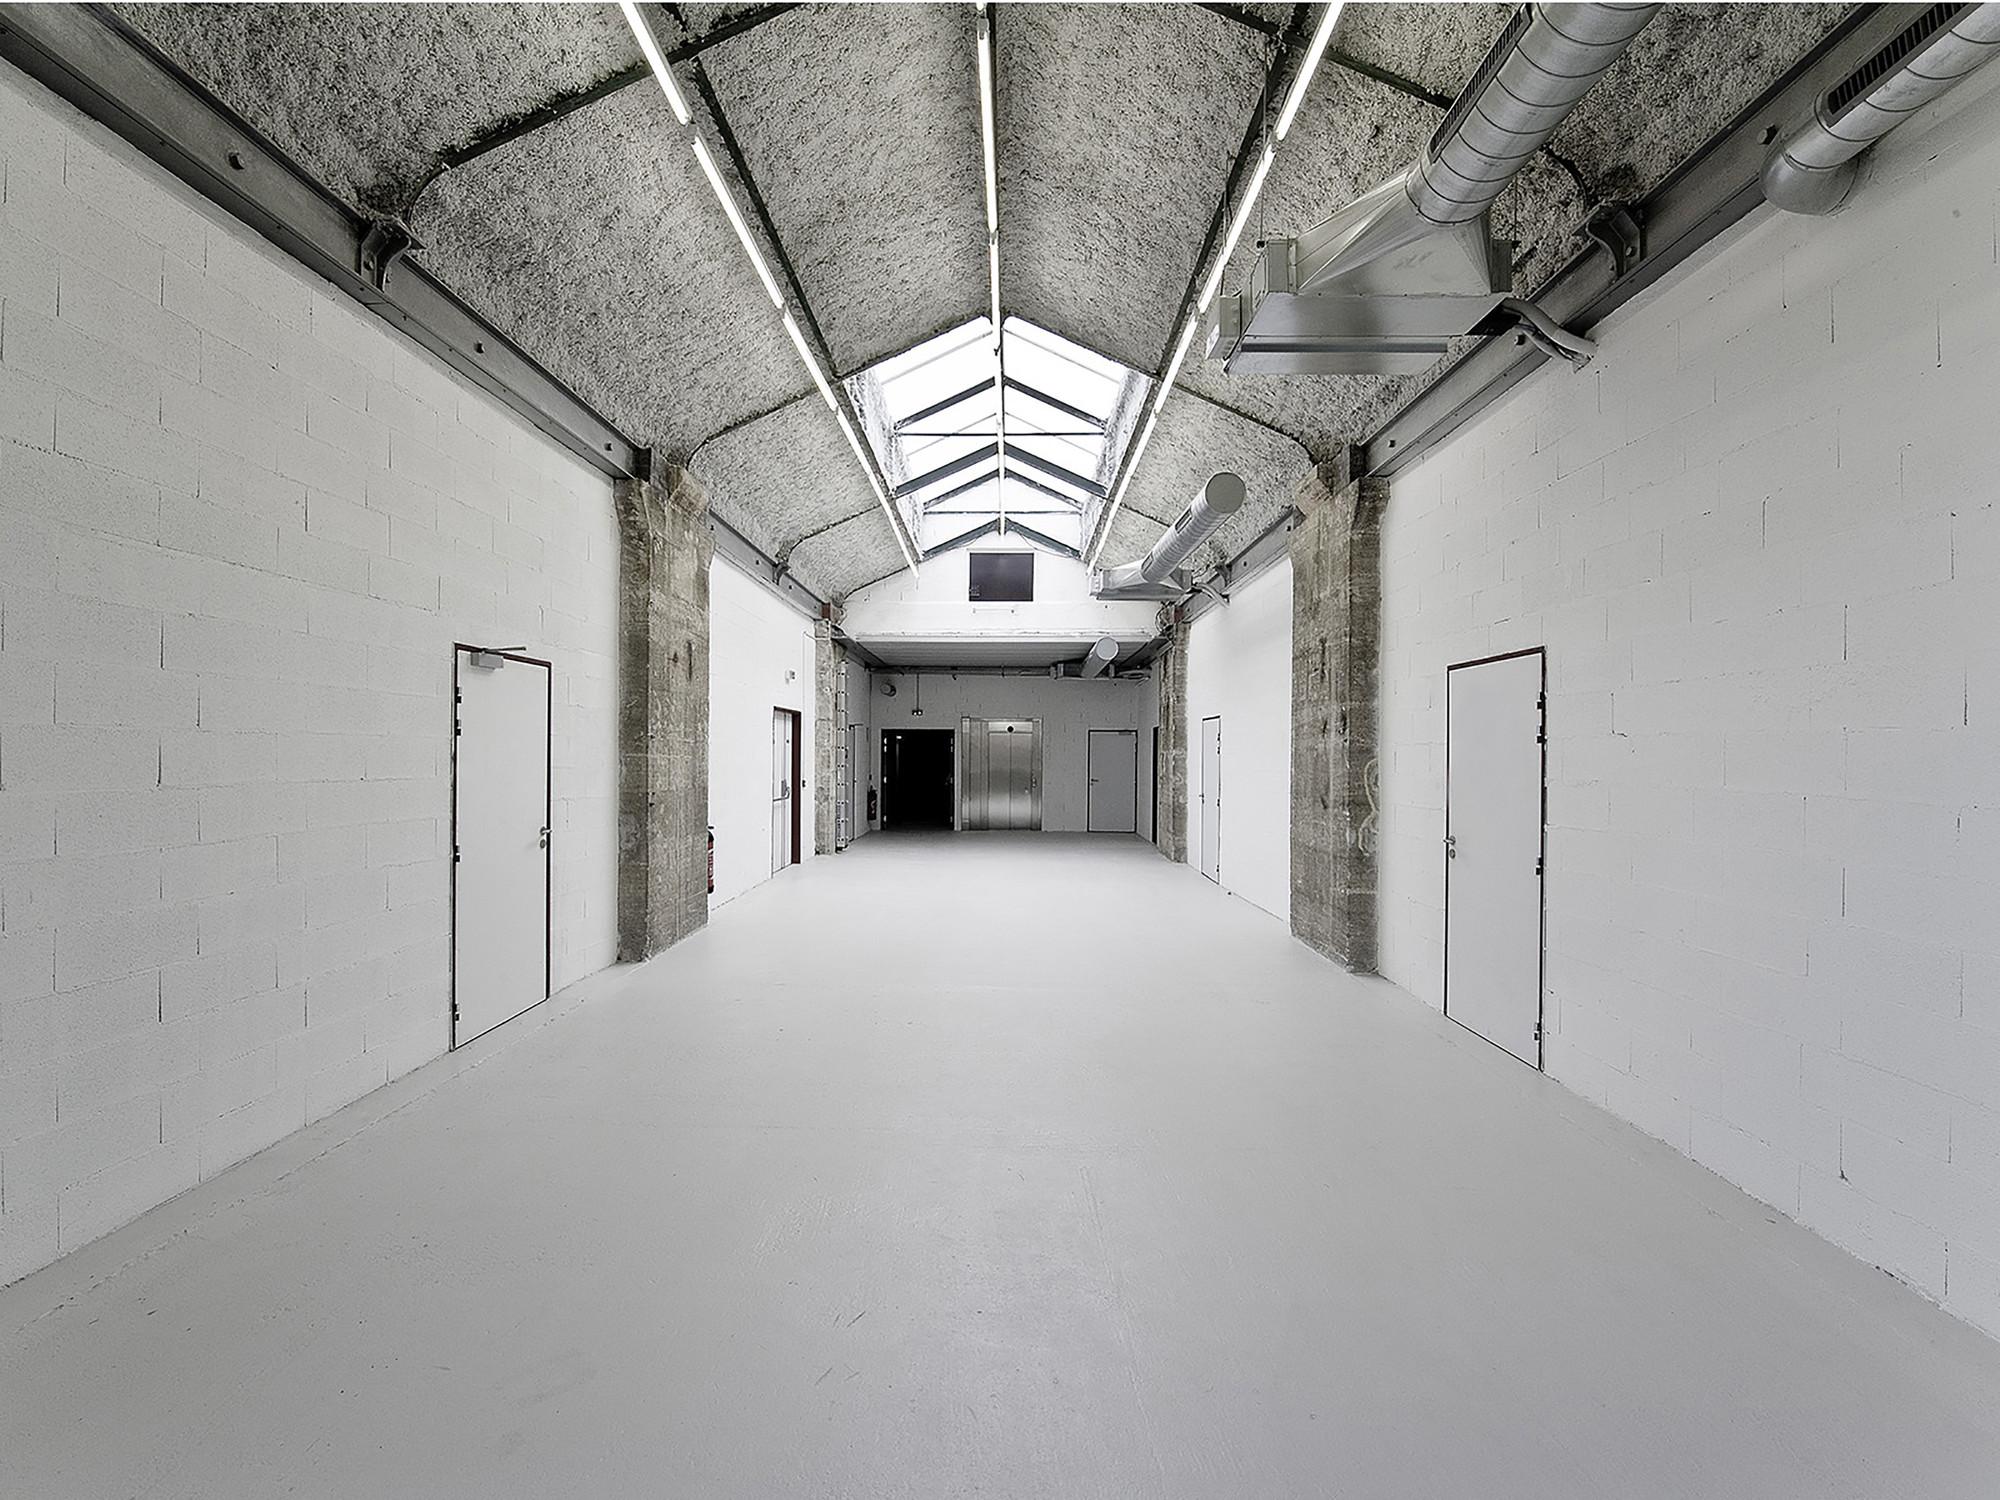 Warehouse transformation into Visual Arts School  / Matthieu Place  + Thomas Raynaud, Courtesy of Thomas Raynaud